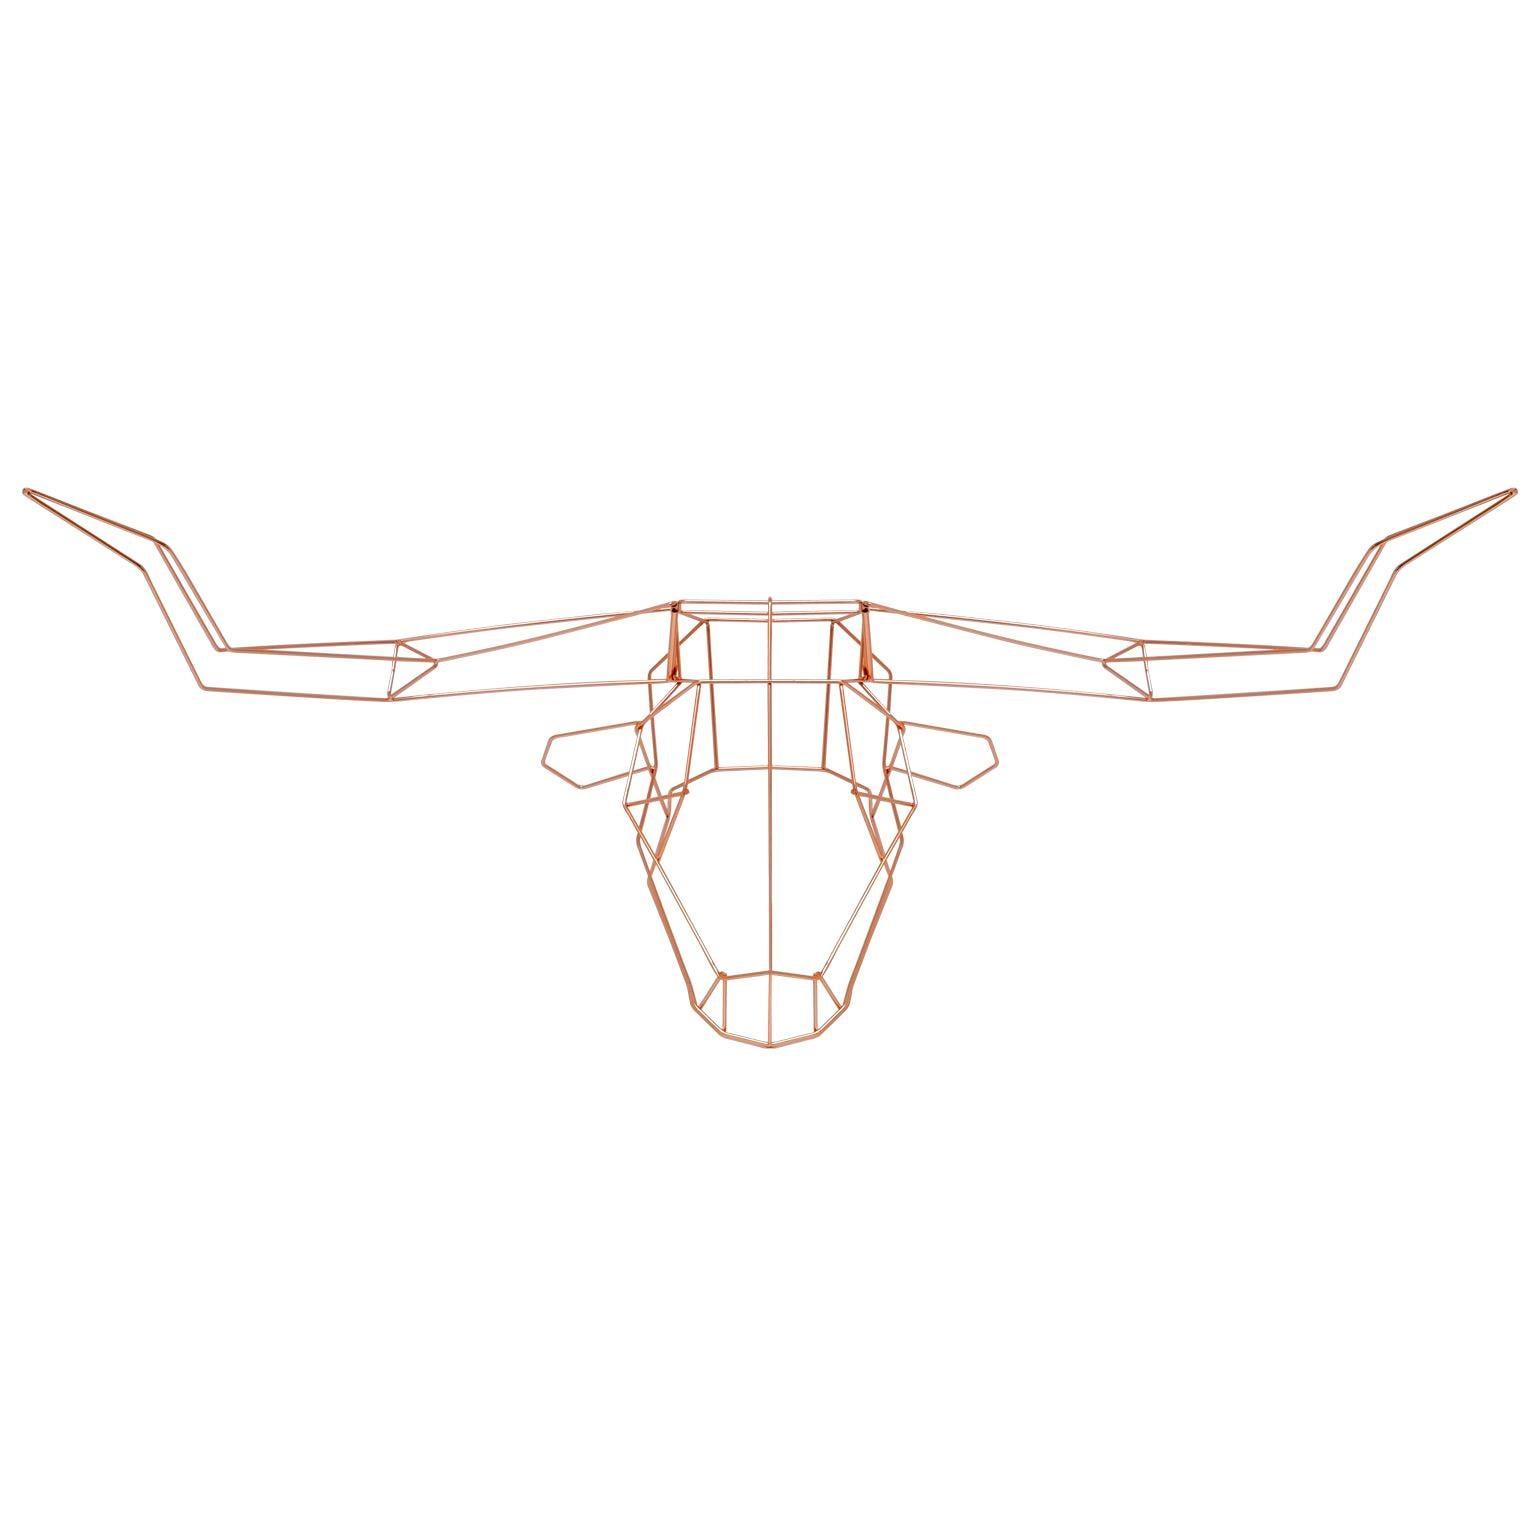 Animal Sculpture, Wall Art, The Long Horn by Bend Goods, Copper